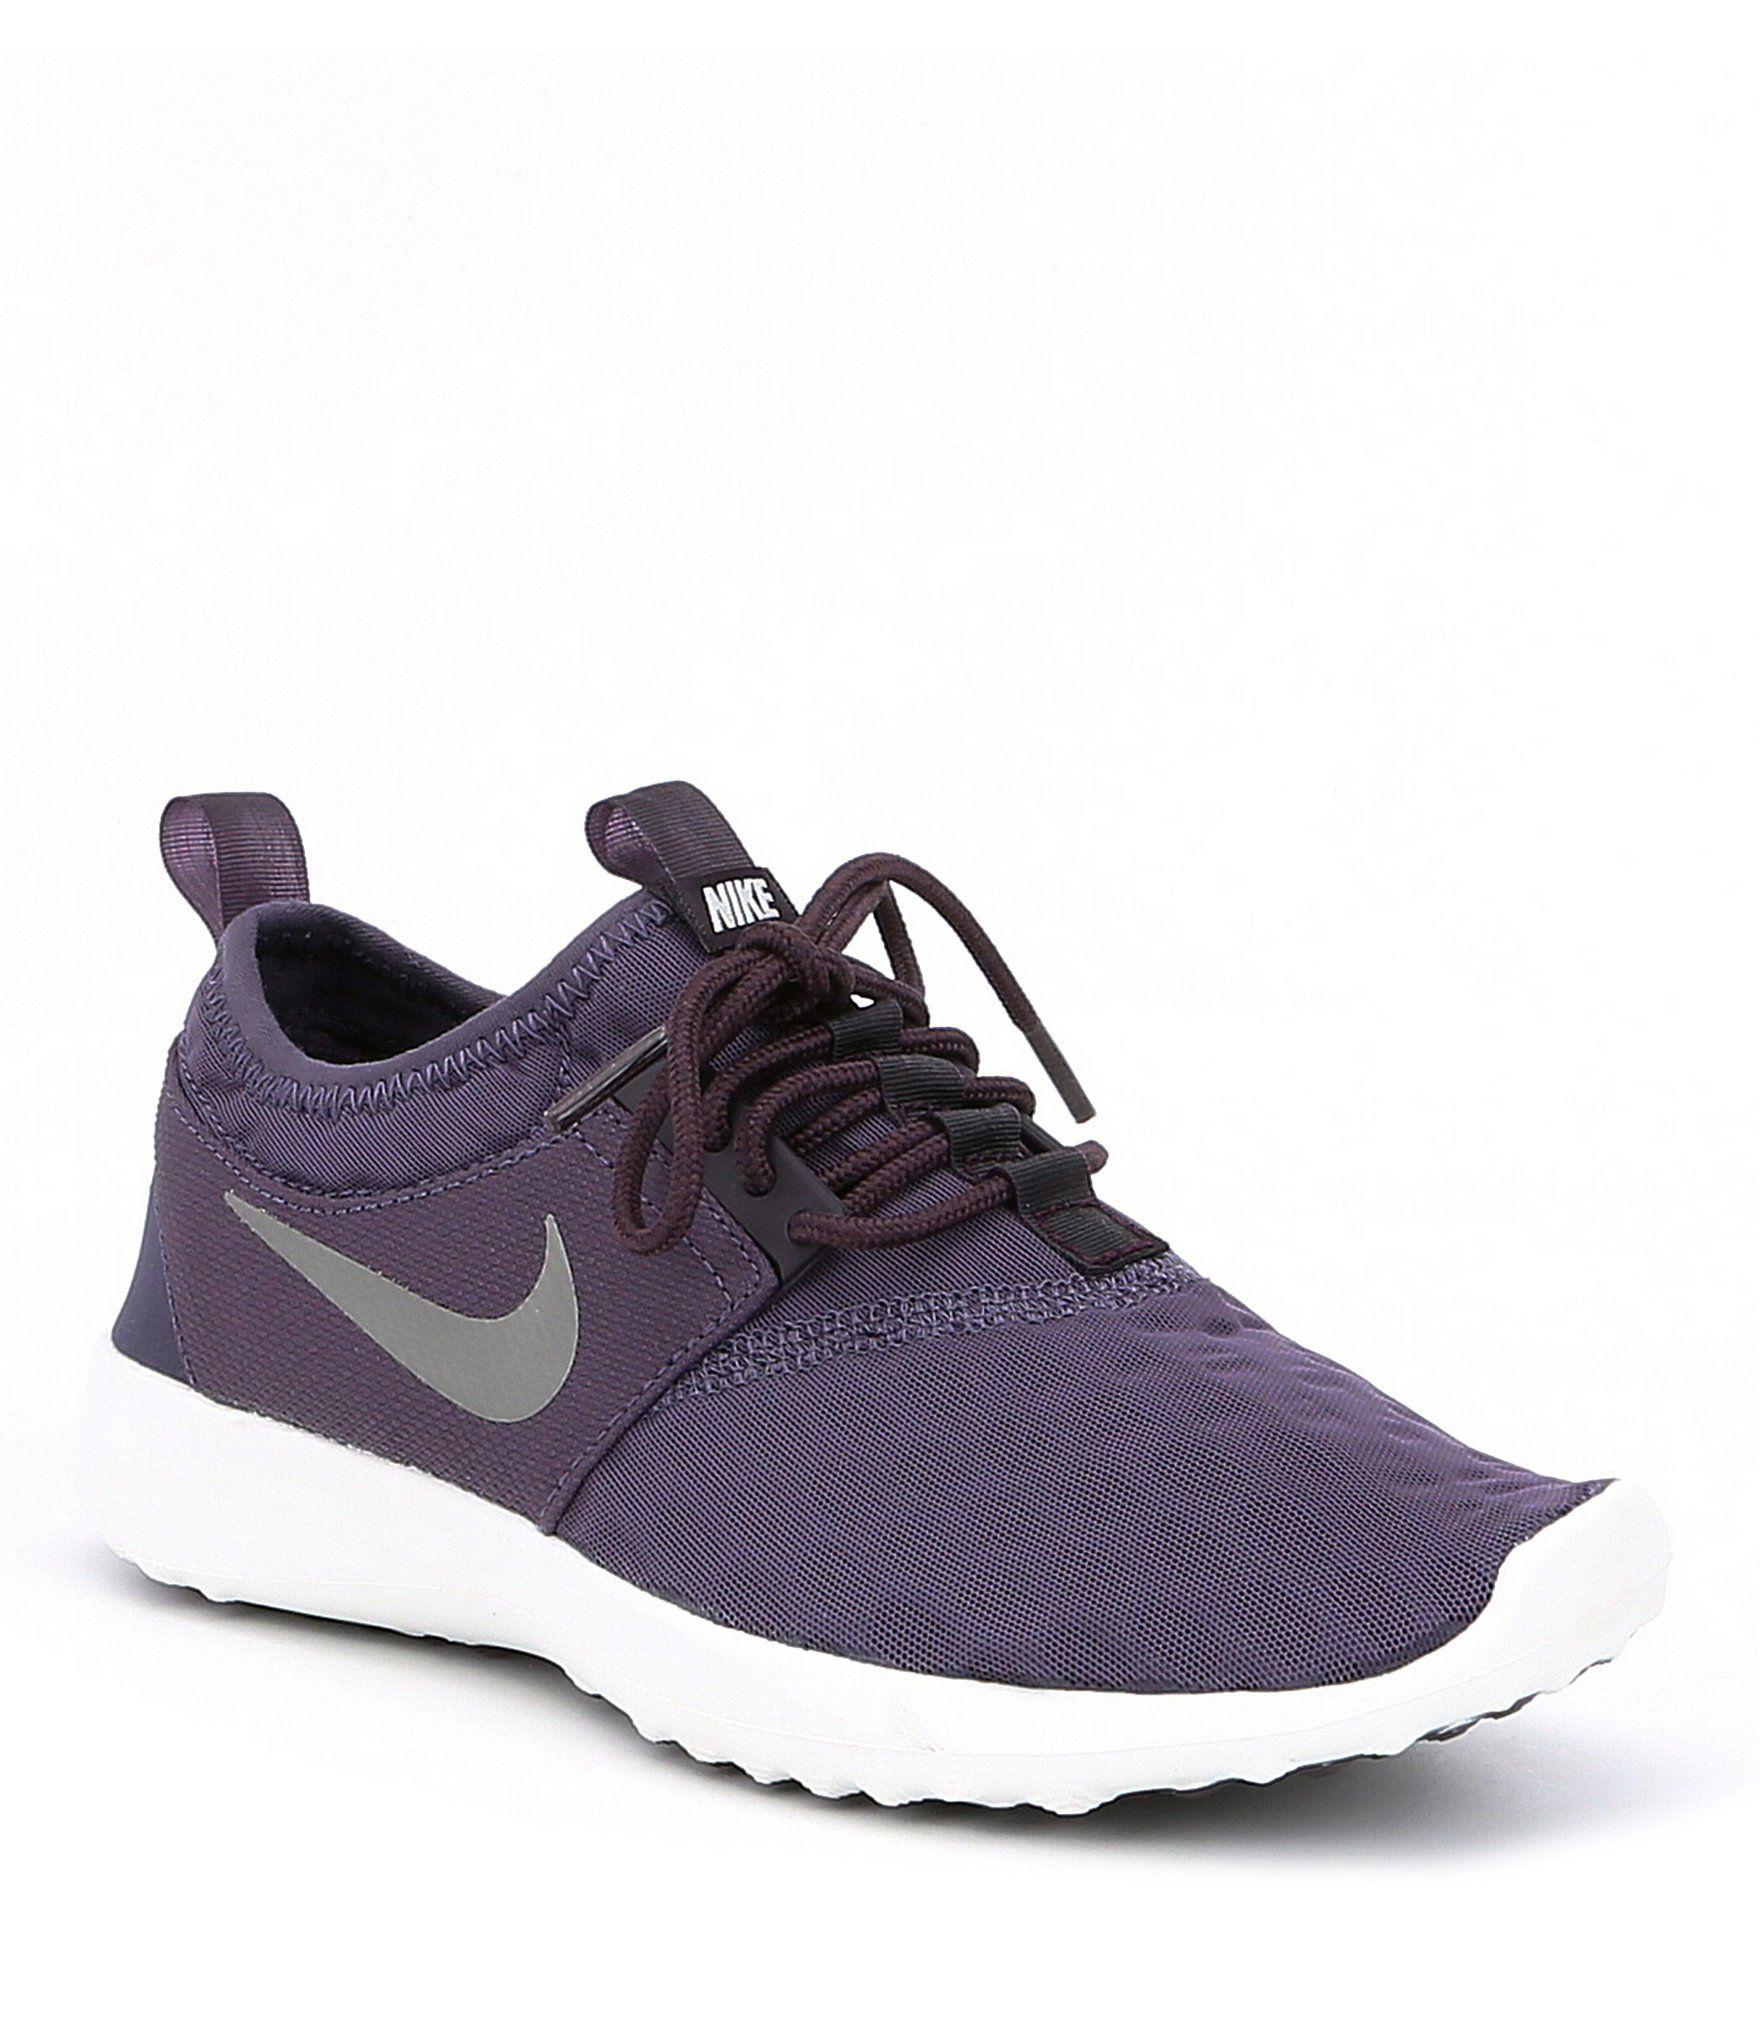 best loved a9b6c f3910 Nike Women s Juvenate Lifestyle Shoes  Dillards